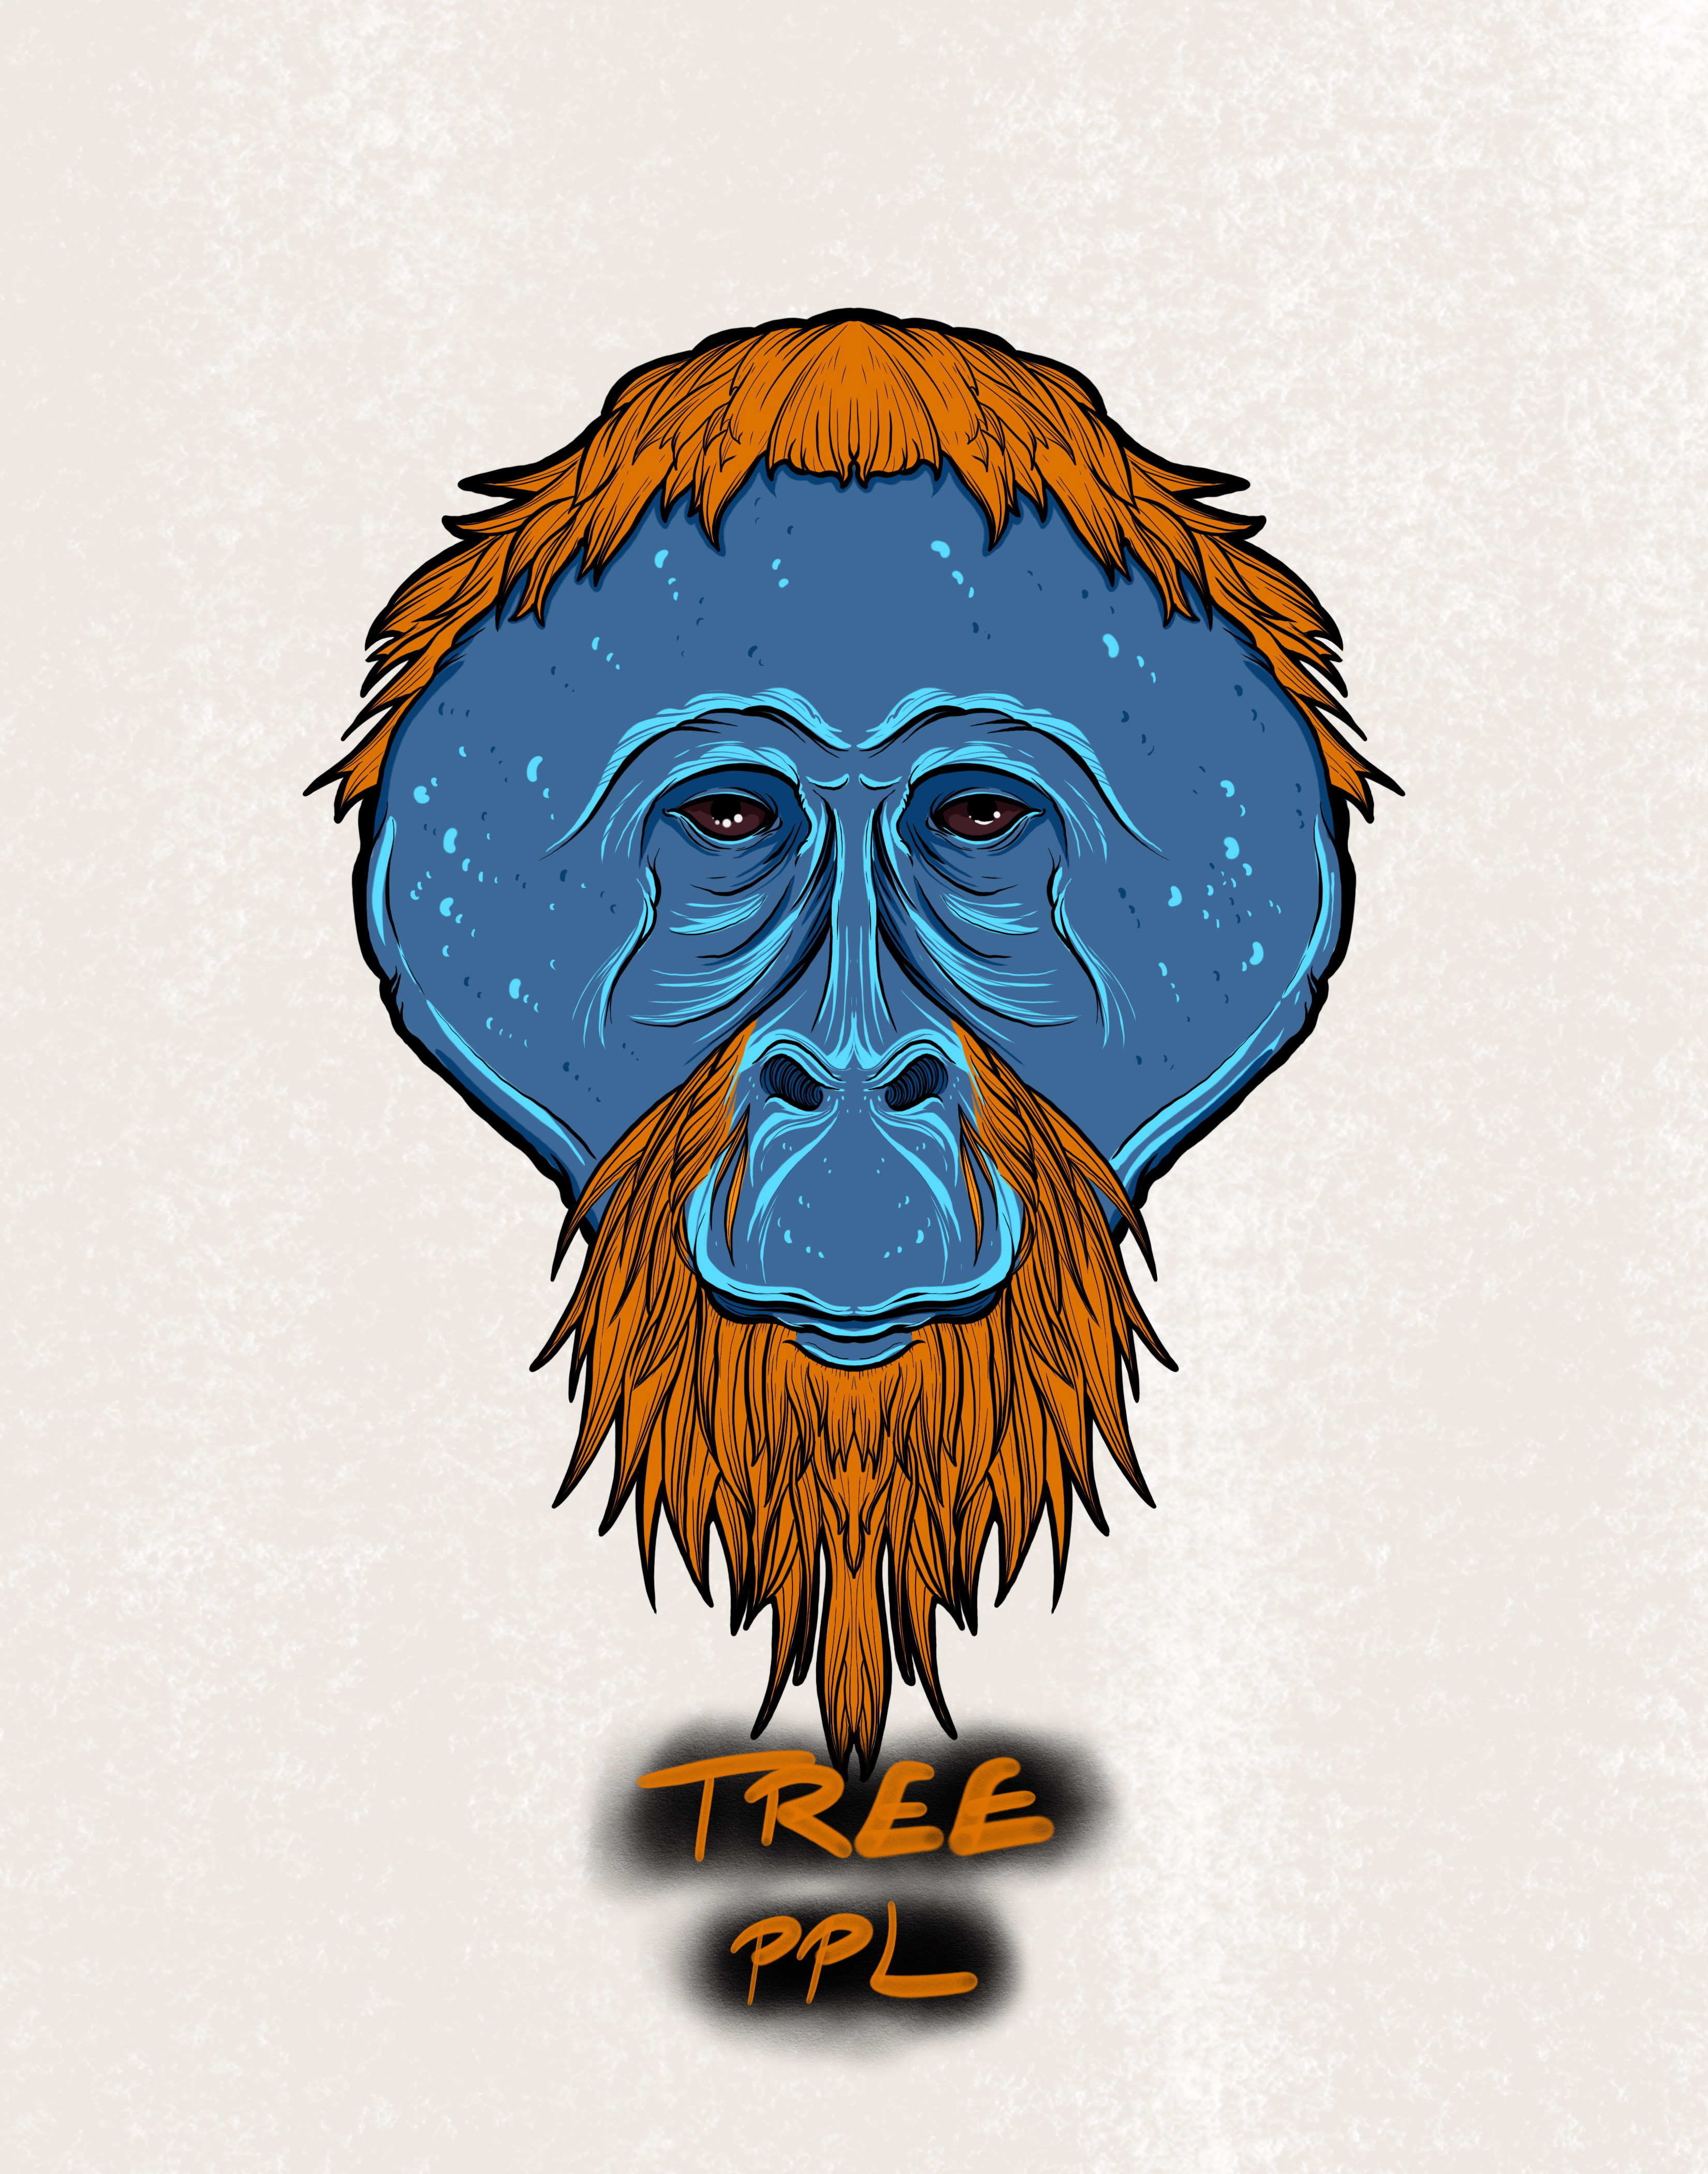 Tree Ppl